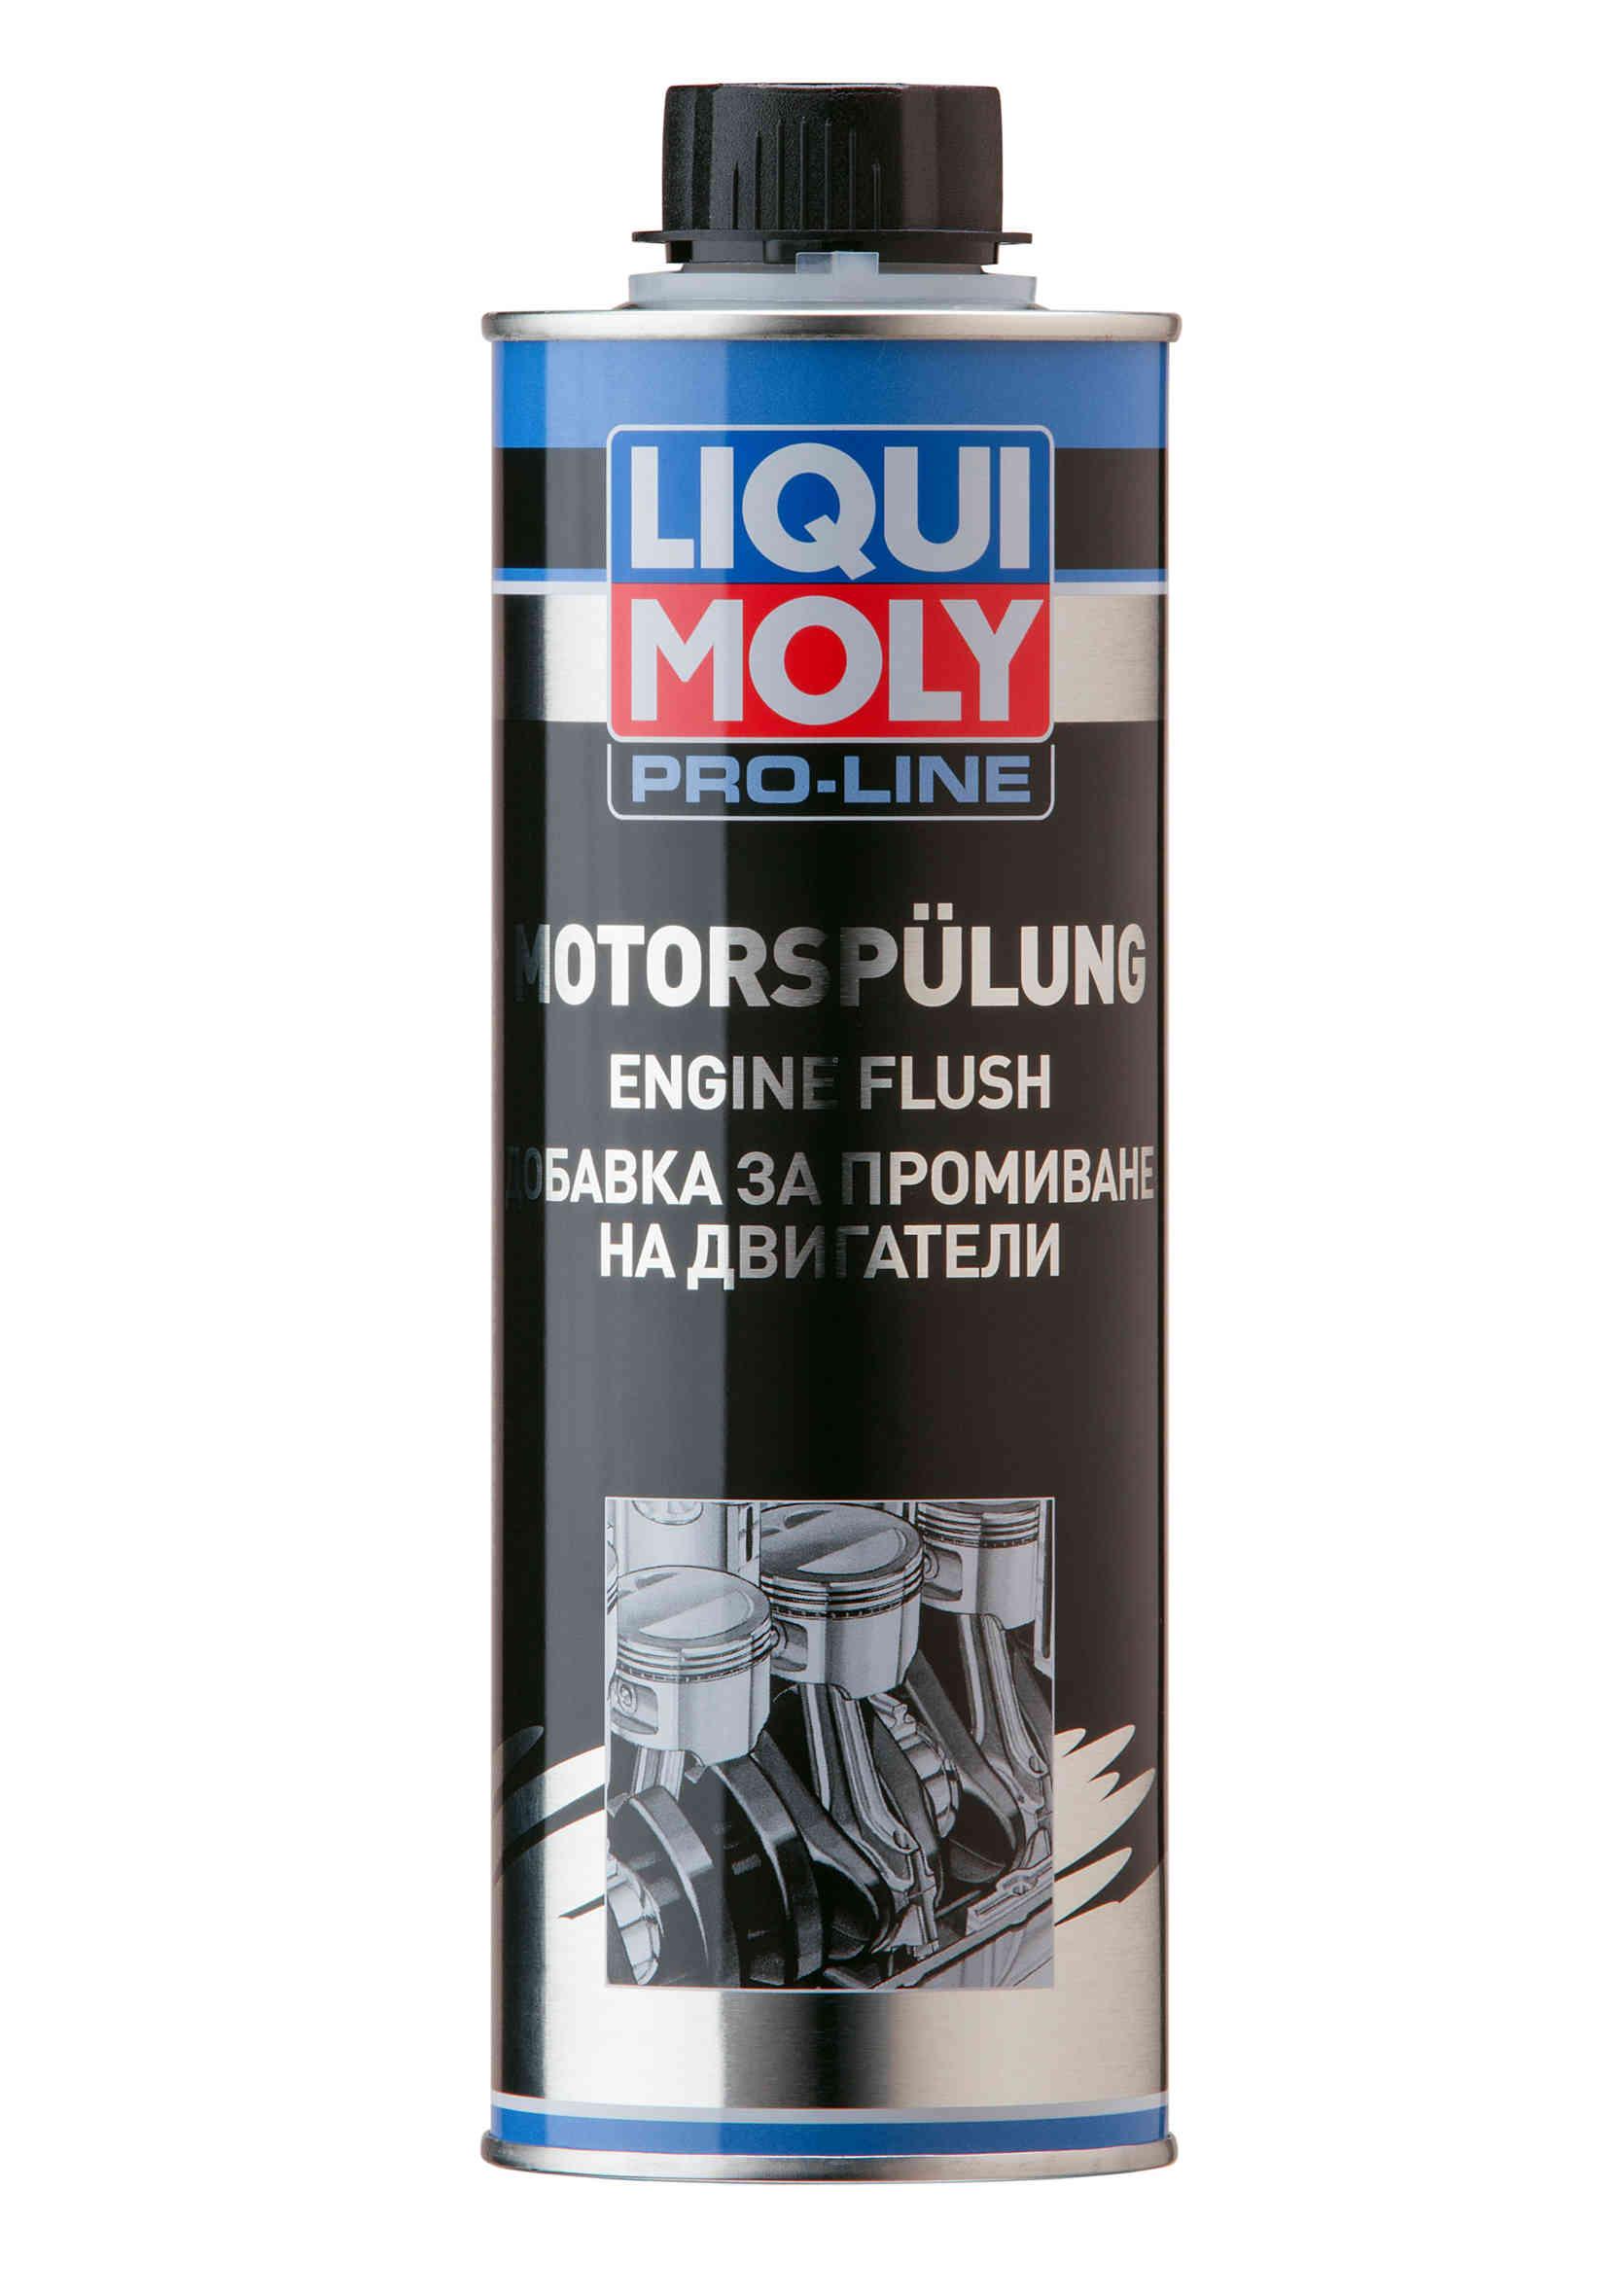 Liqui Moly Pro-Line 2662 Engine Flush 500ml